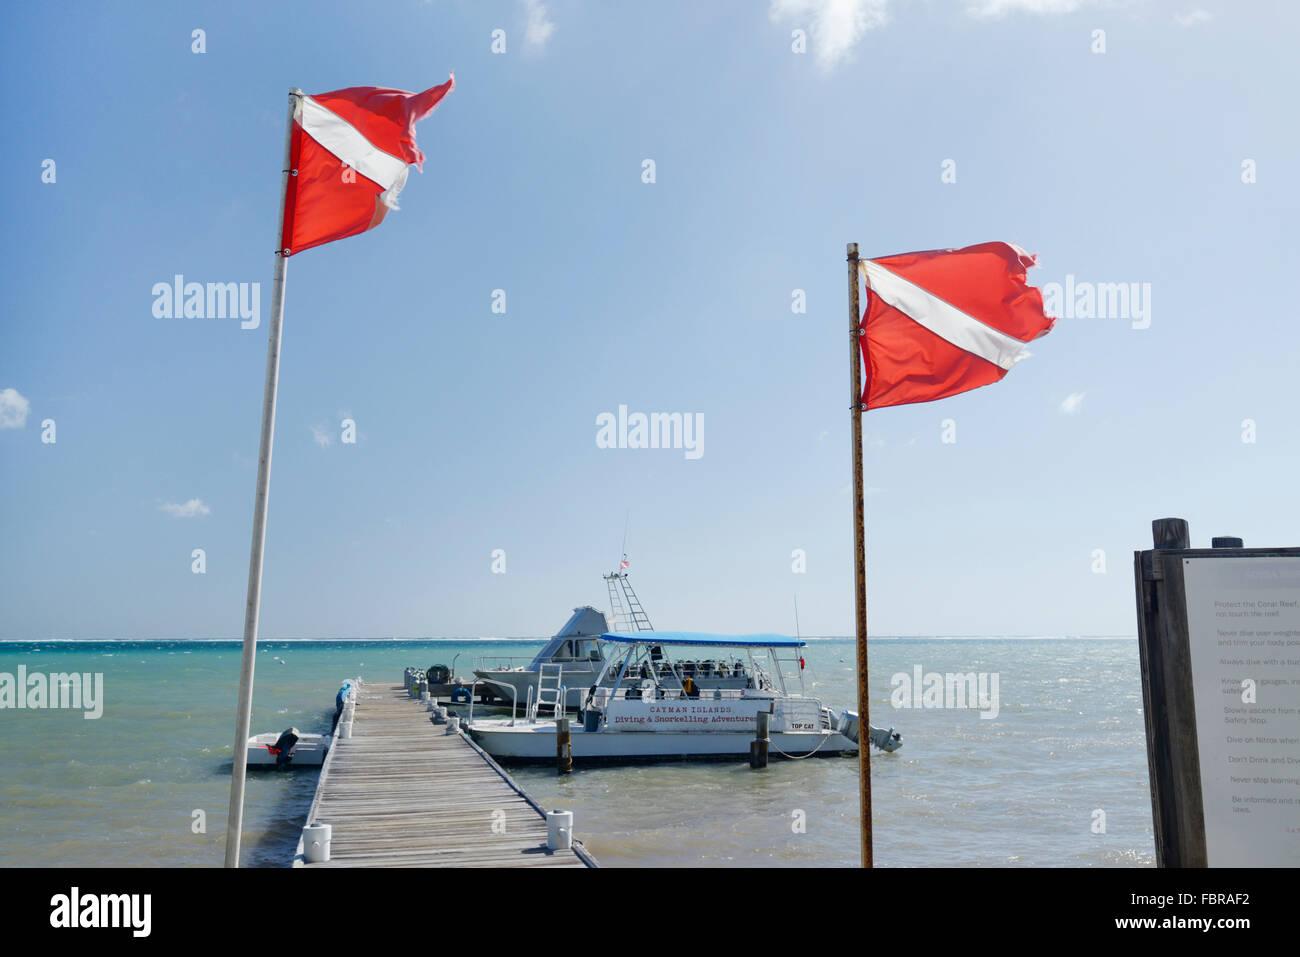 Dive barche ormeggiate, oceano frontiere, East End, Grand Cayman Immagini Stock